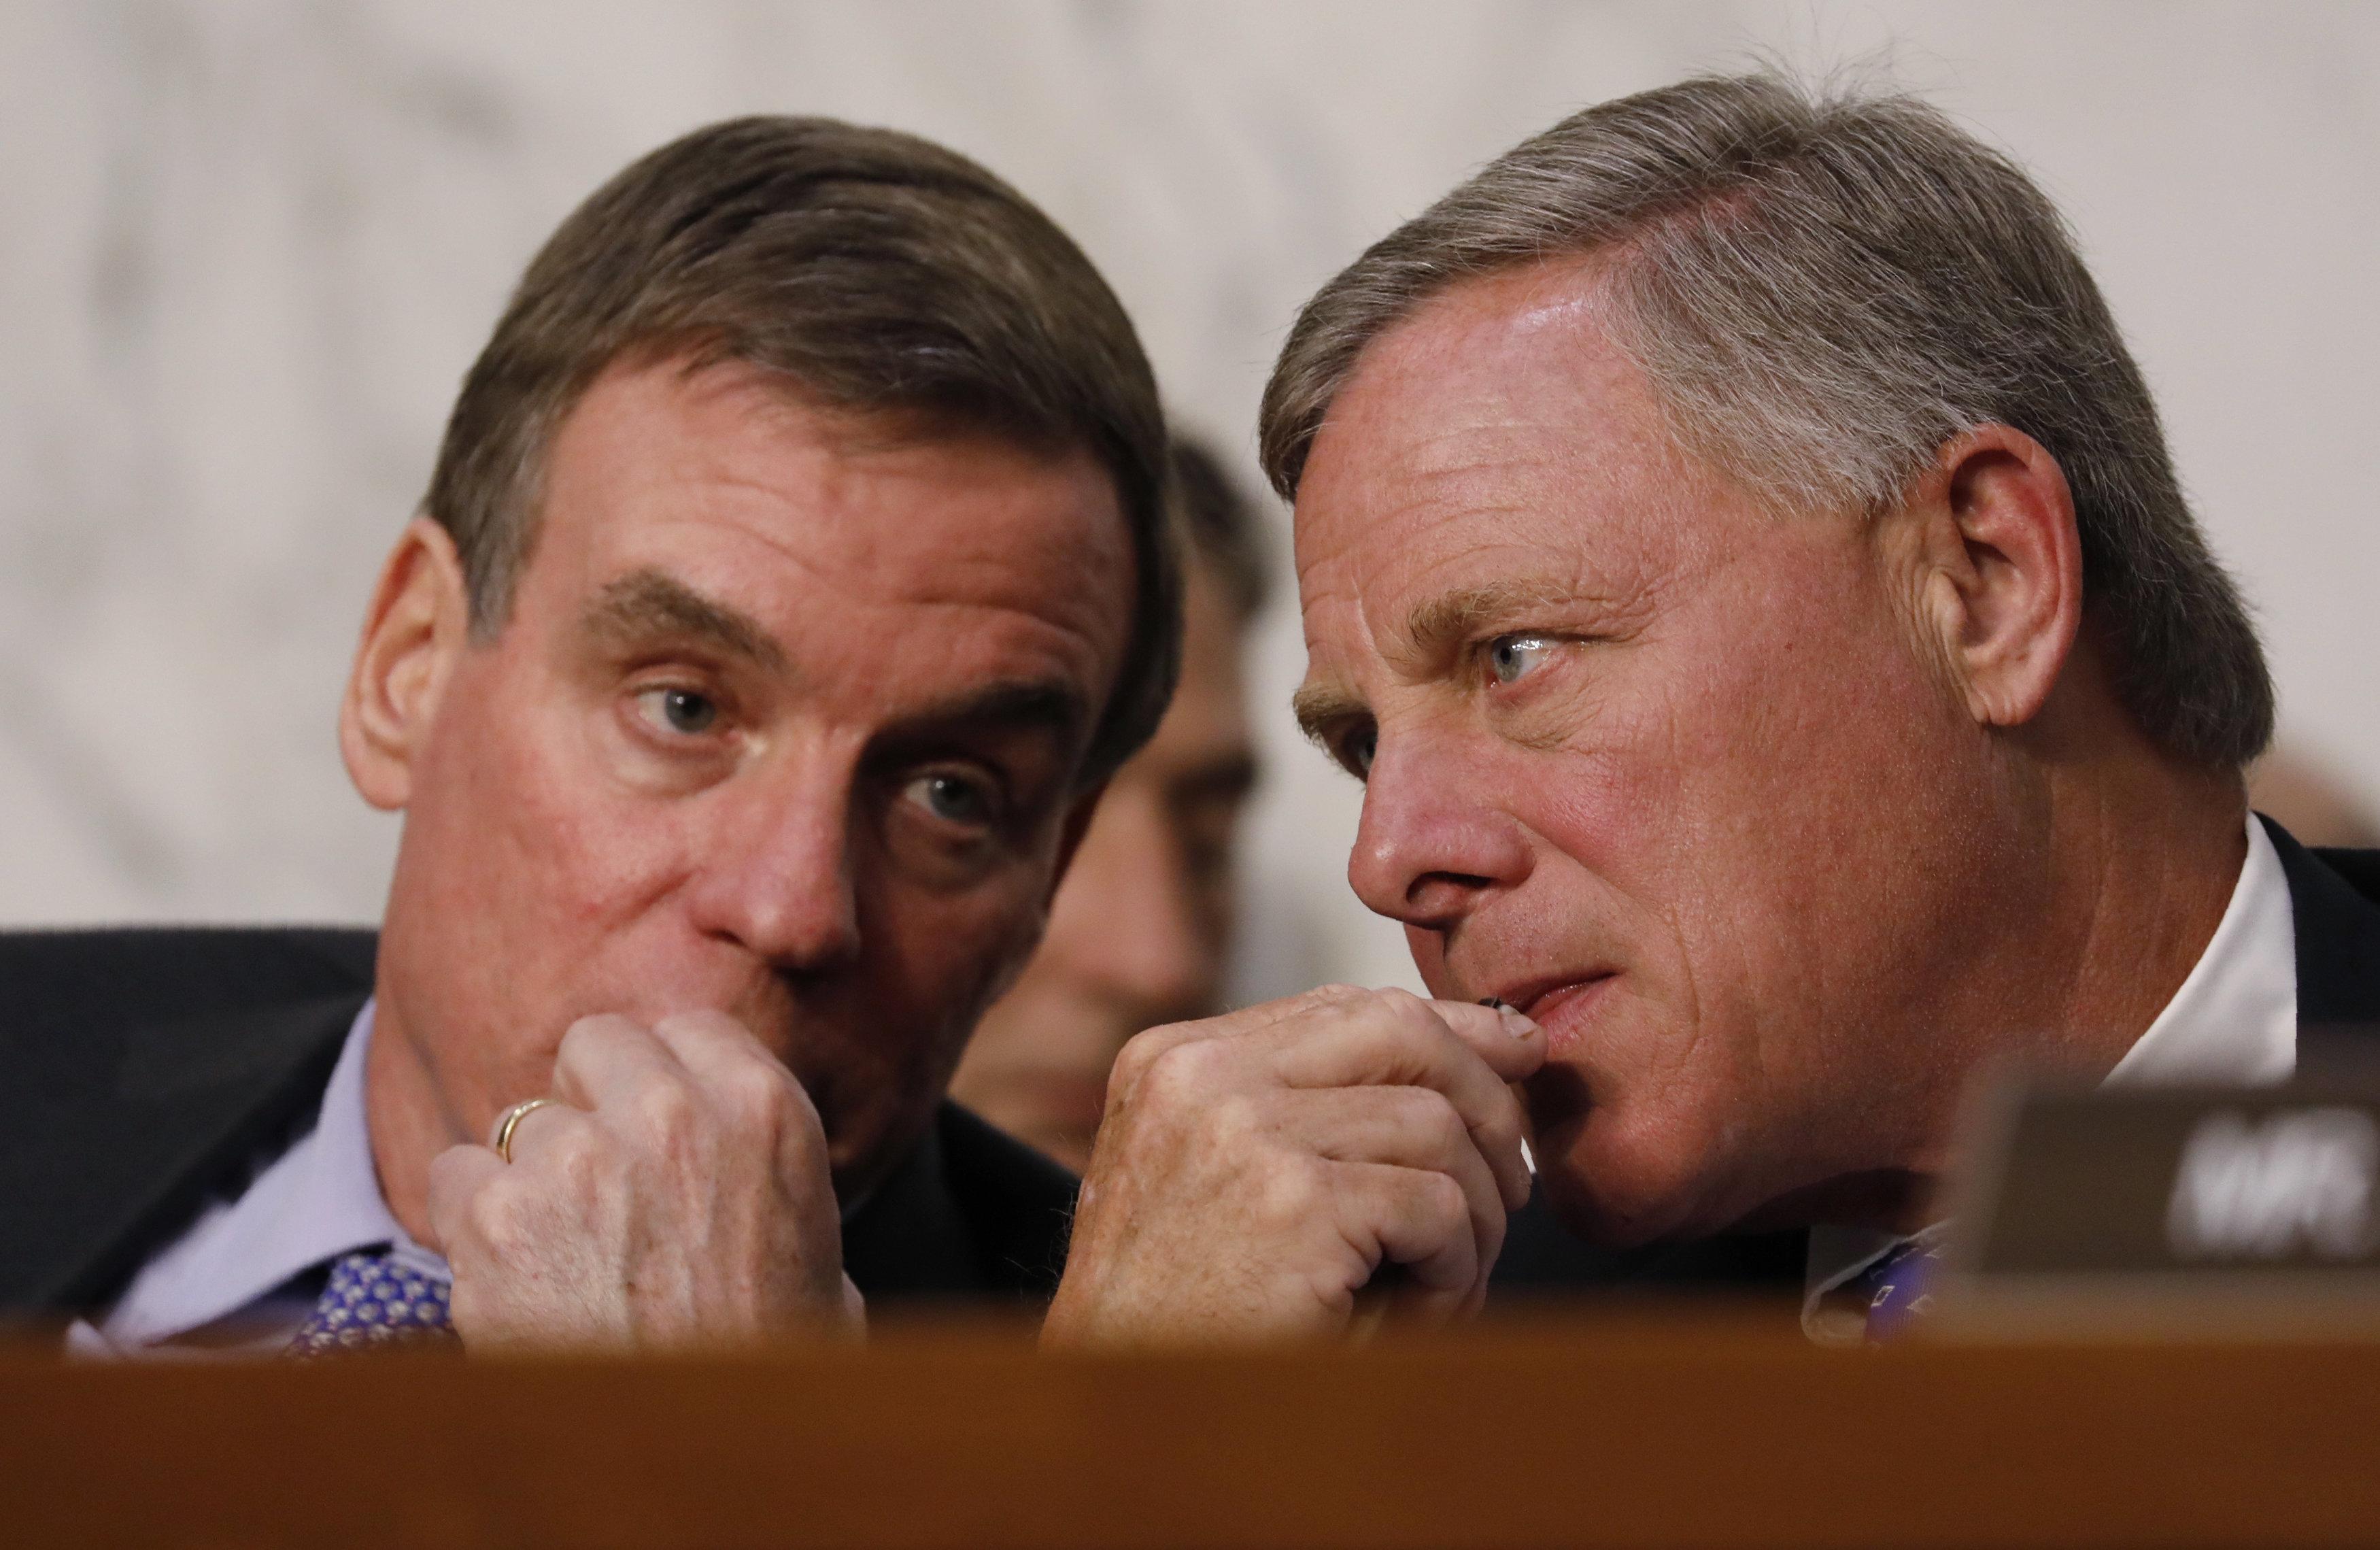 Senate Intelligence Committee vice chairman Sen. Mark Warner and chairman Sen. Richard Burr listen as U.S. Attorney General J